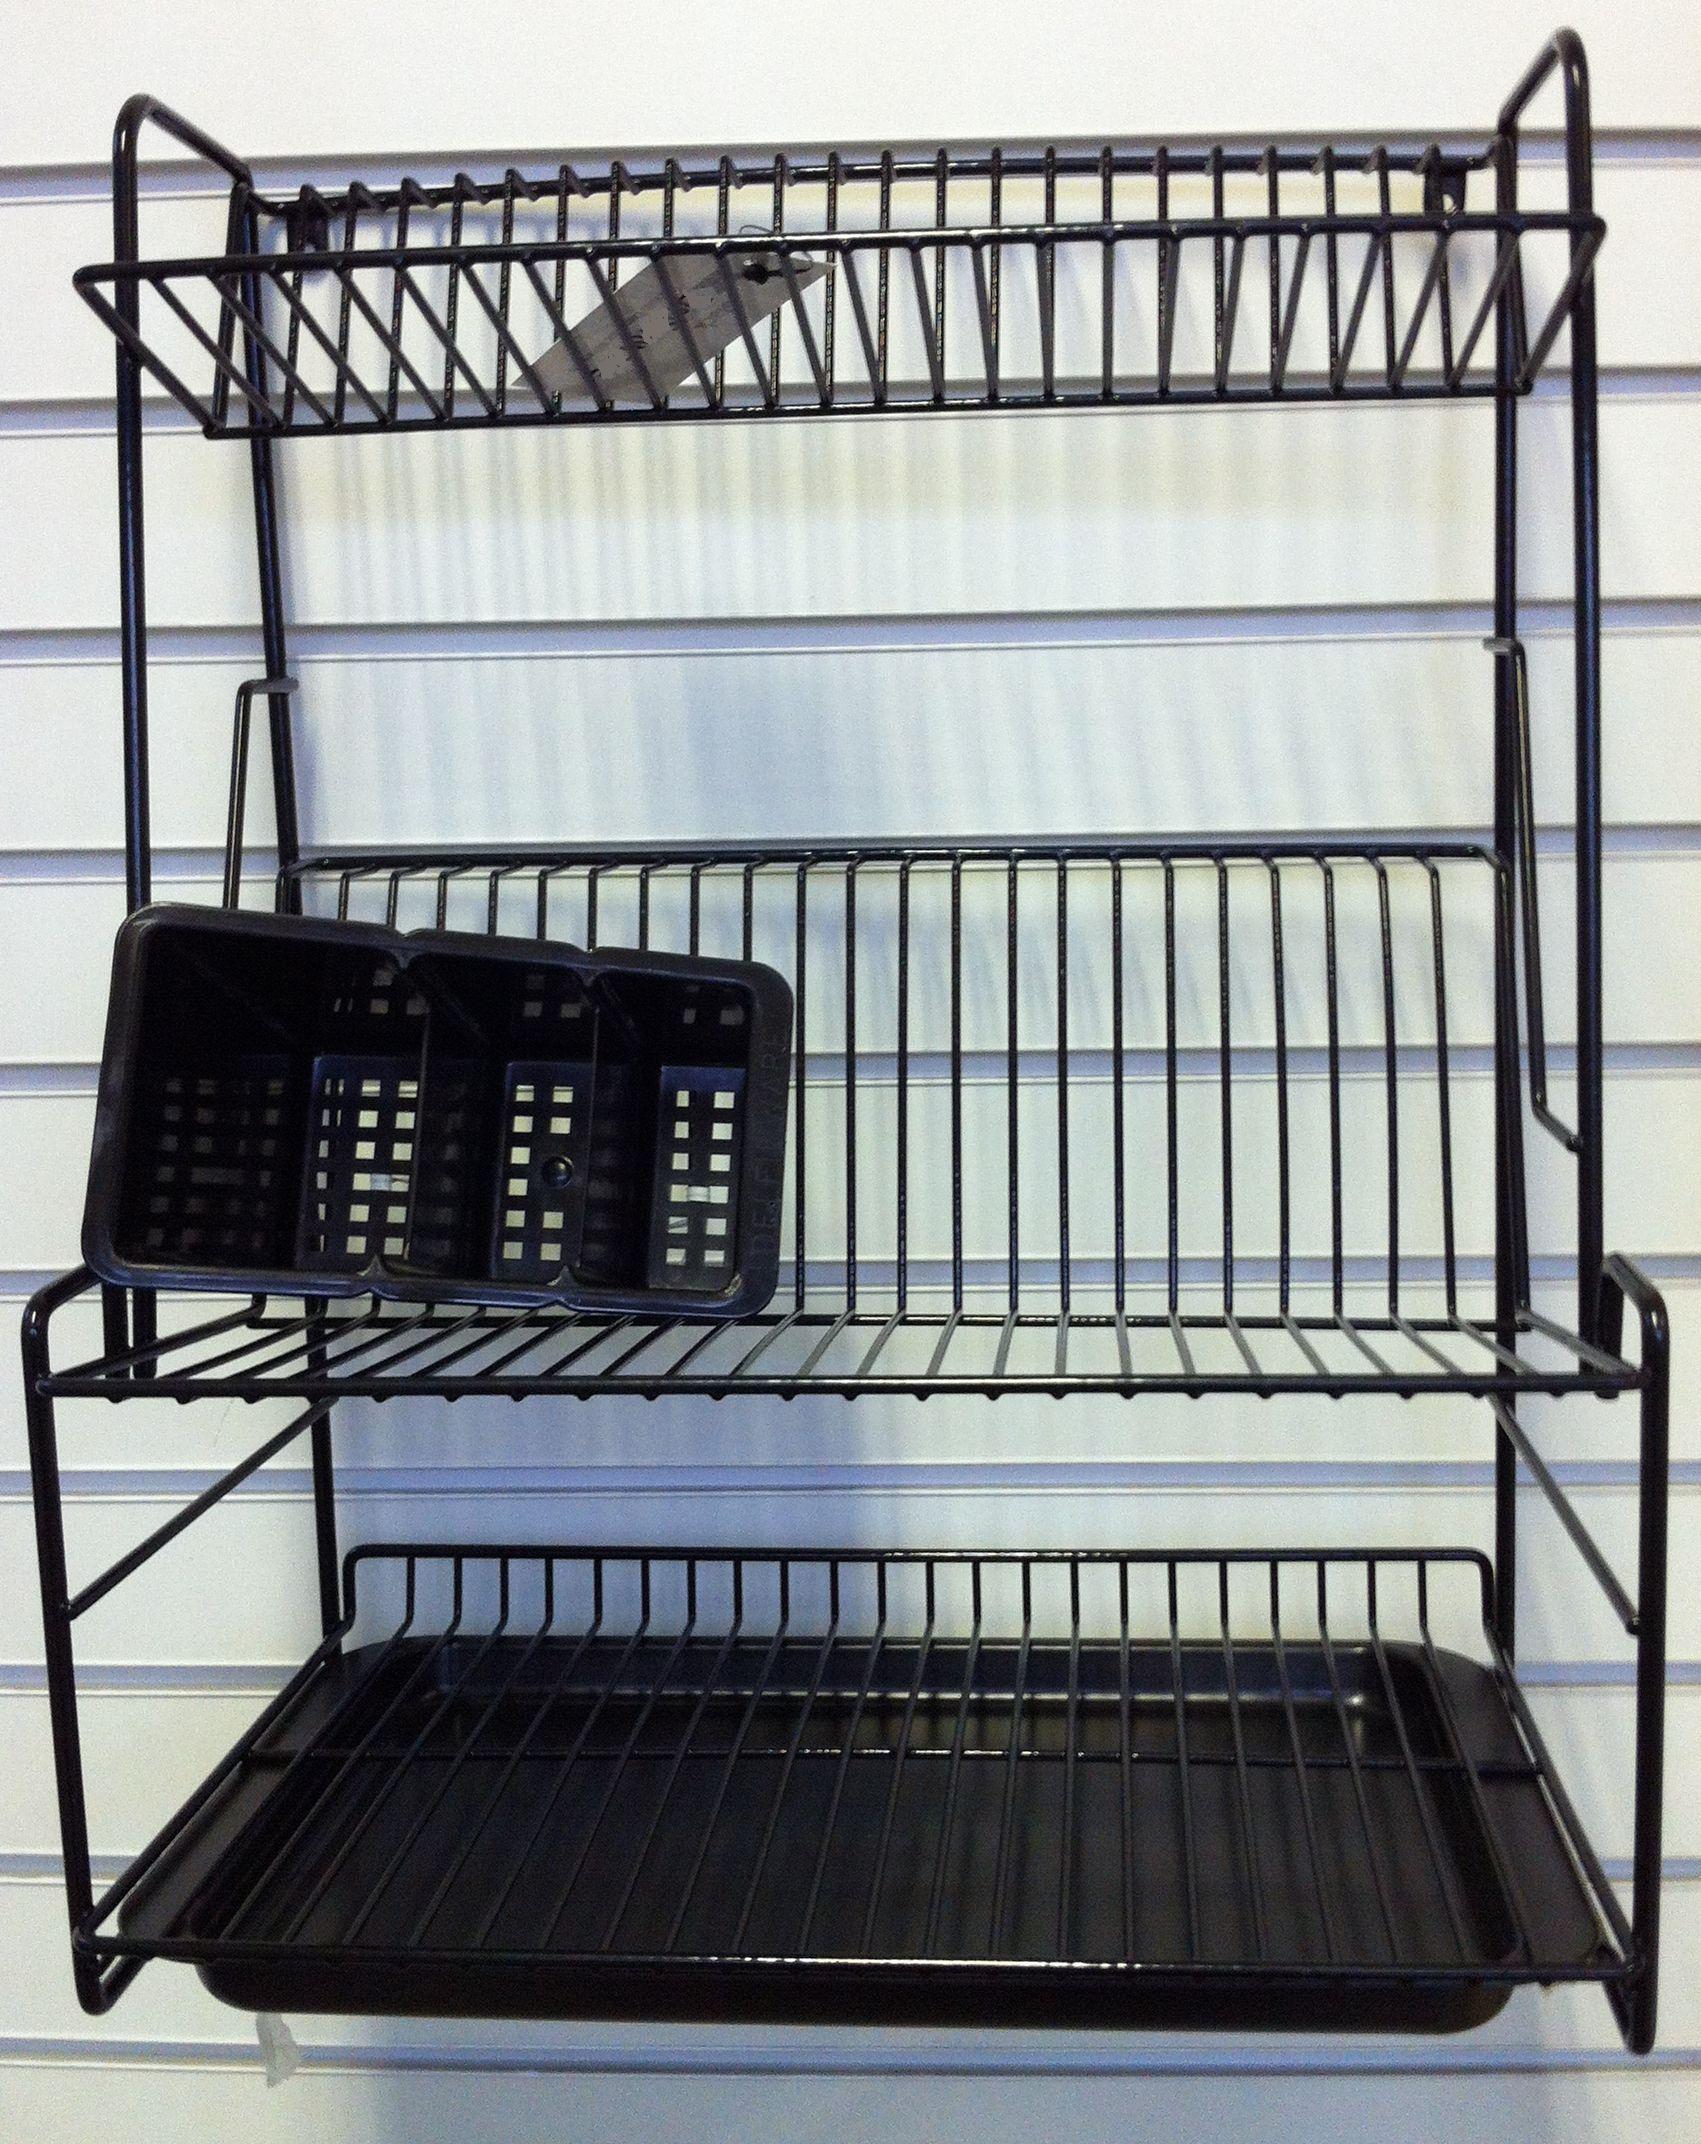 Black Plastic Coated Three Tier Dish Drainer